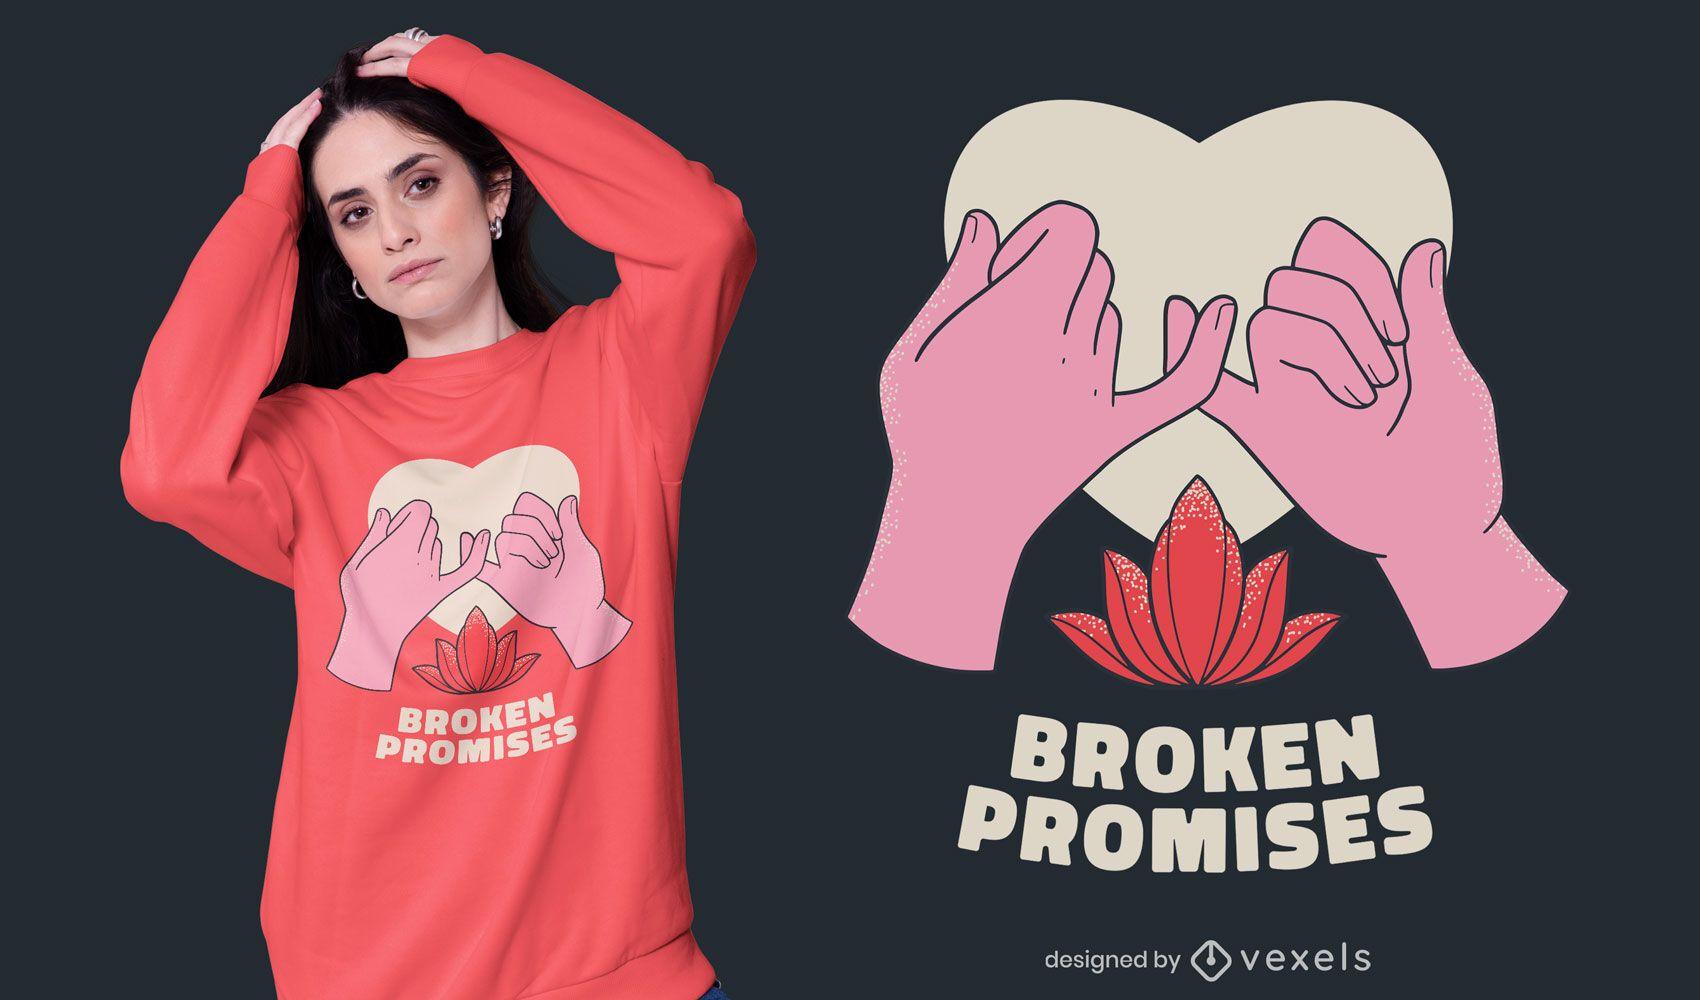 Broken promises t-shirt design